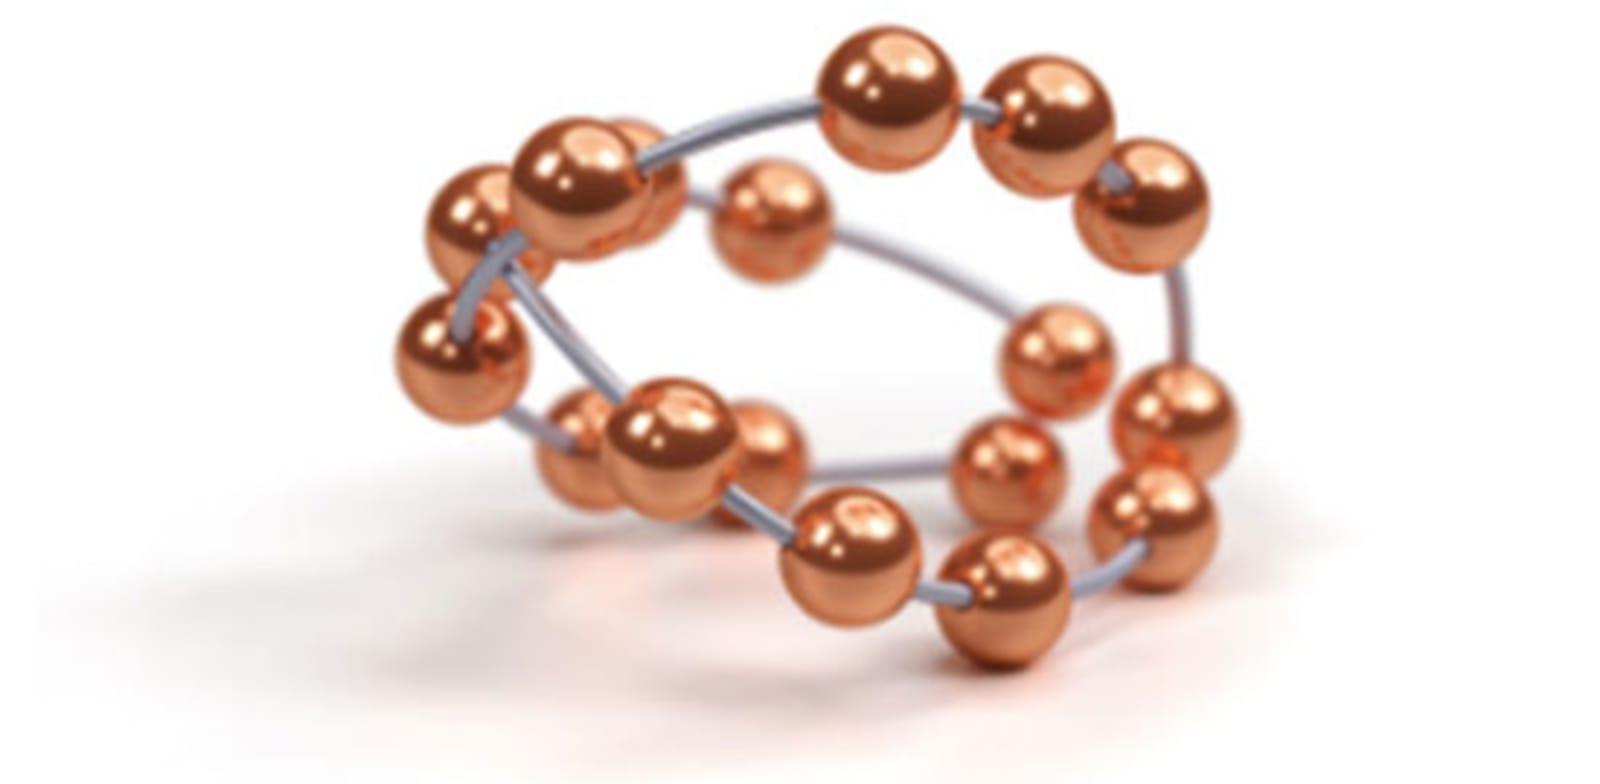 OCON's Bellerin intrauterine device Company website